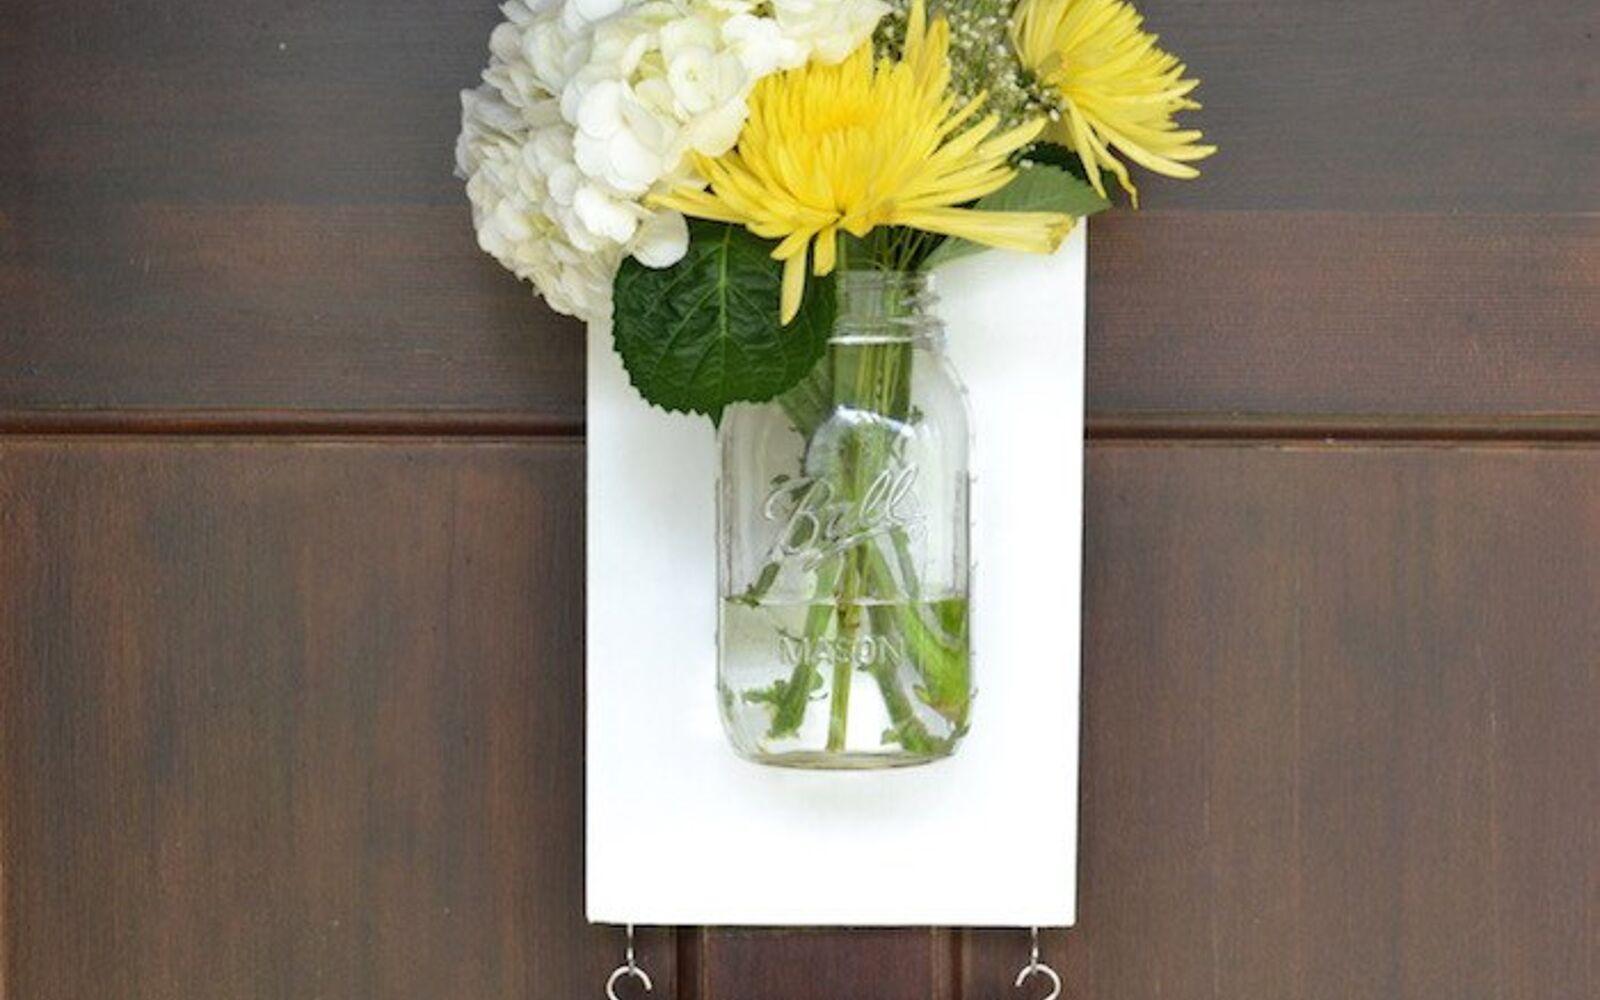 s 30 great mason jar ideas you have to try, Mason Jar Hanging Vase